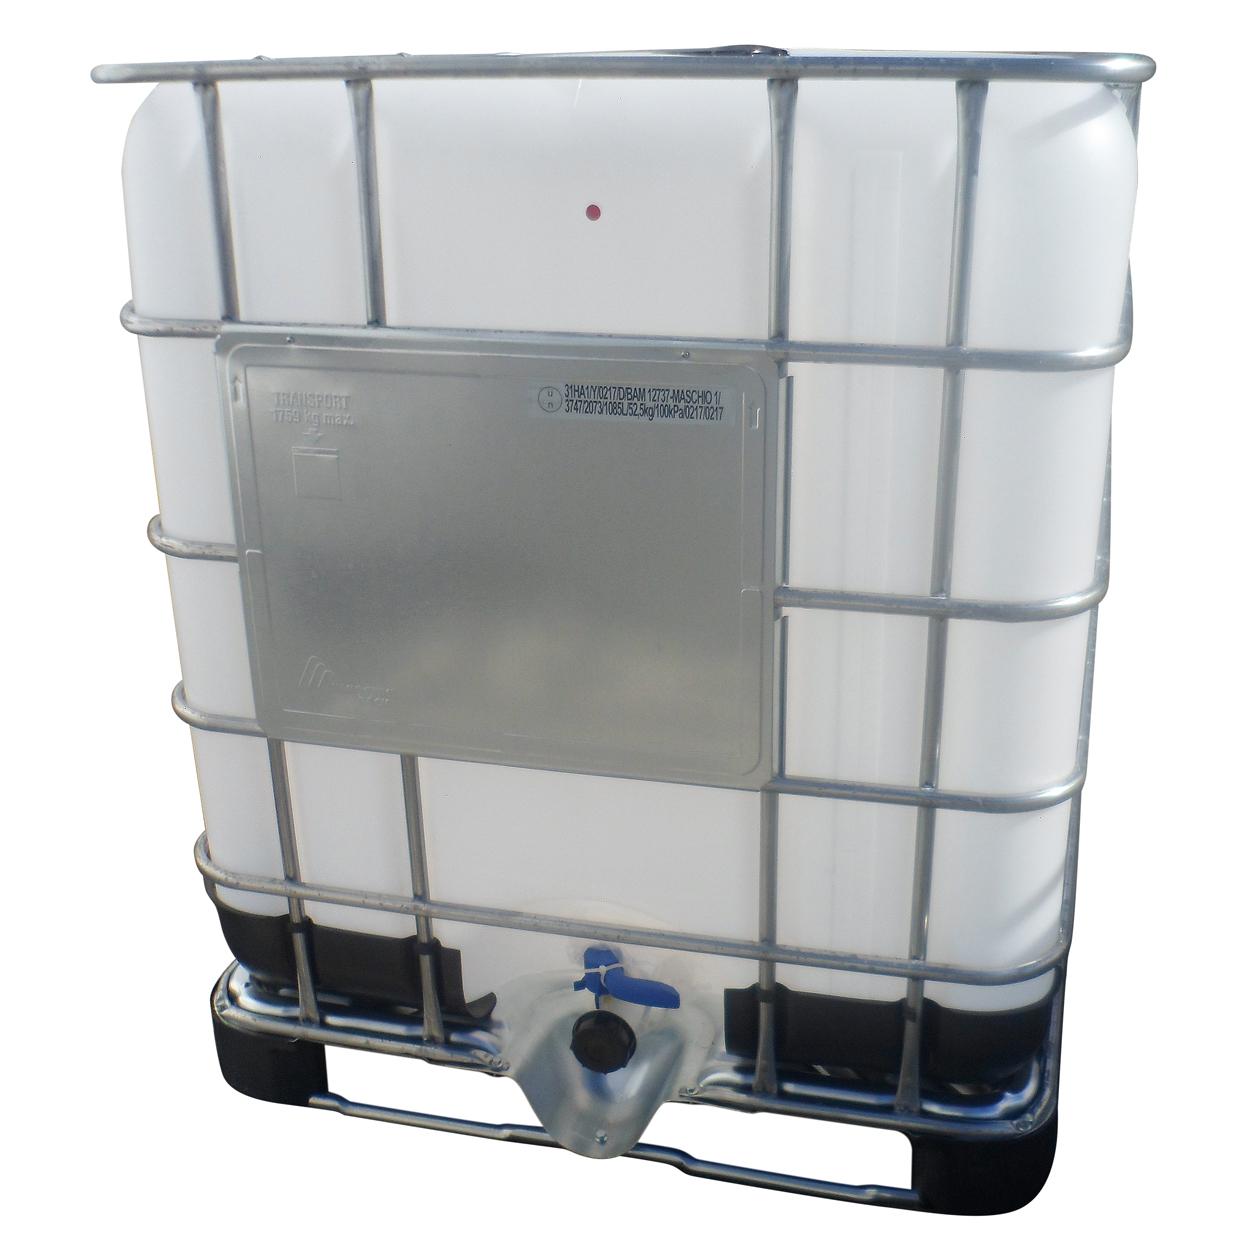 Nový IBC kontejner 1000 l, paleta kov/plast